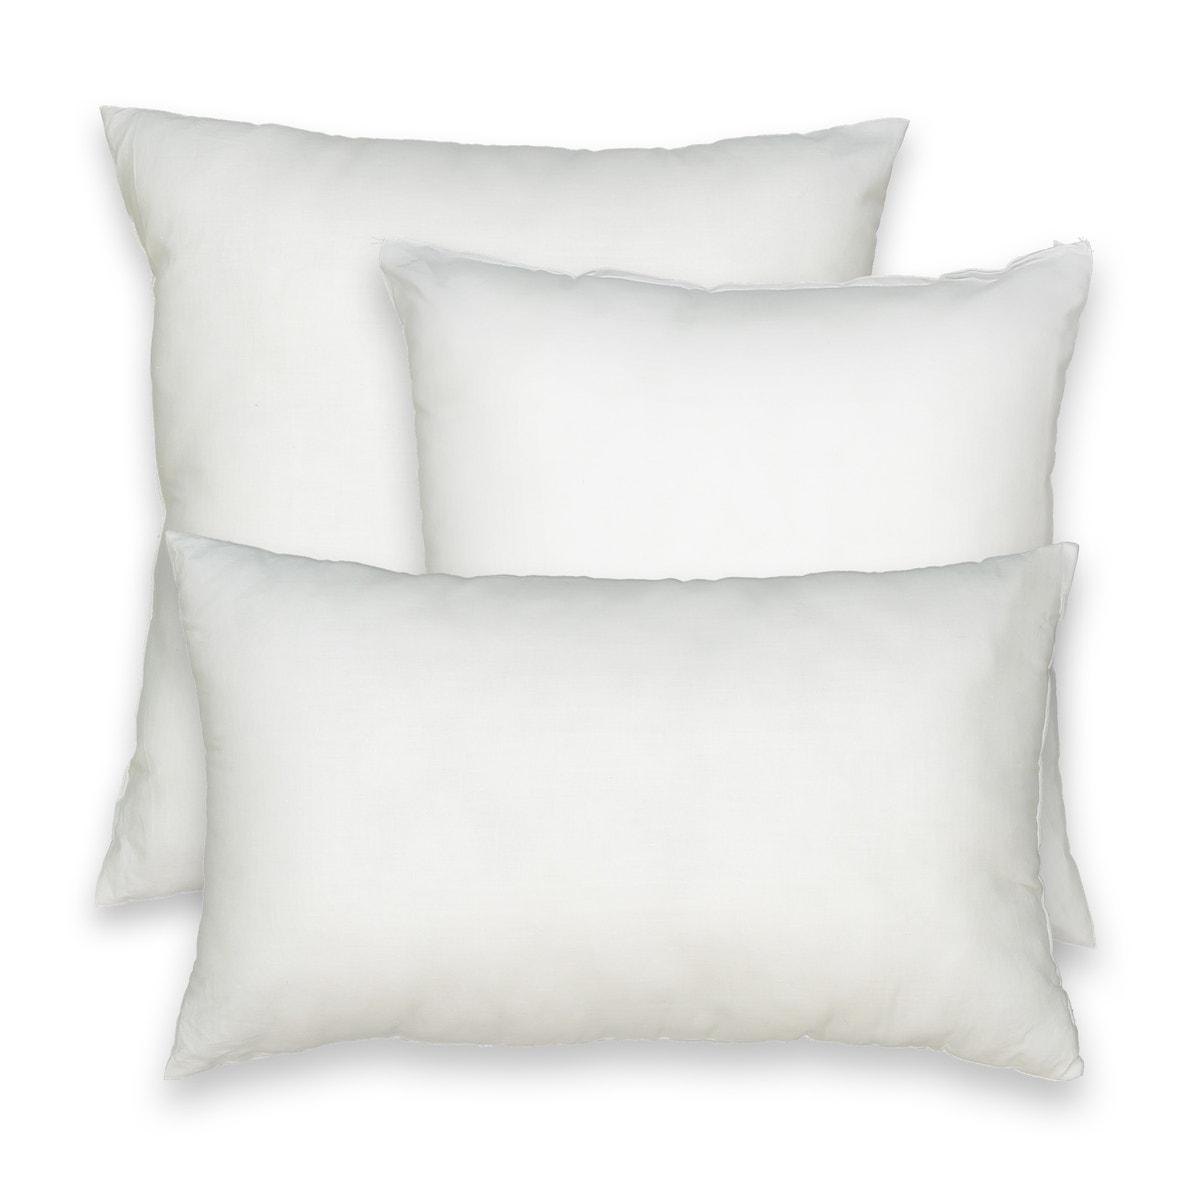 Upholstery cushion Terra (ヌードクッション単品)